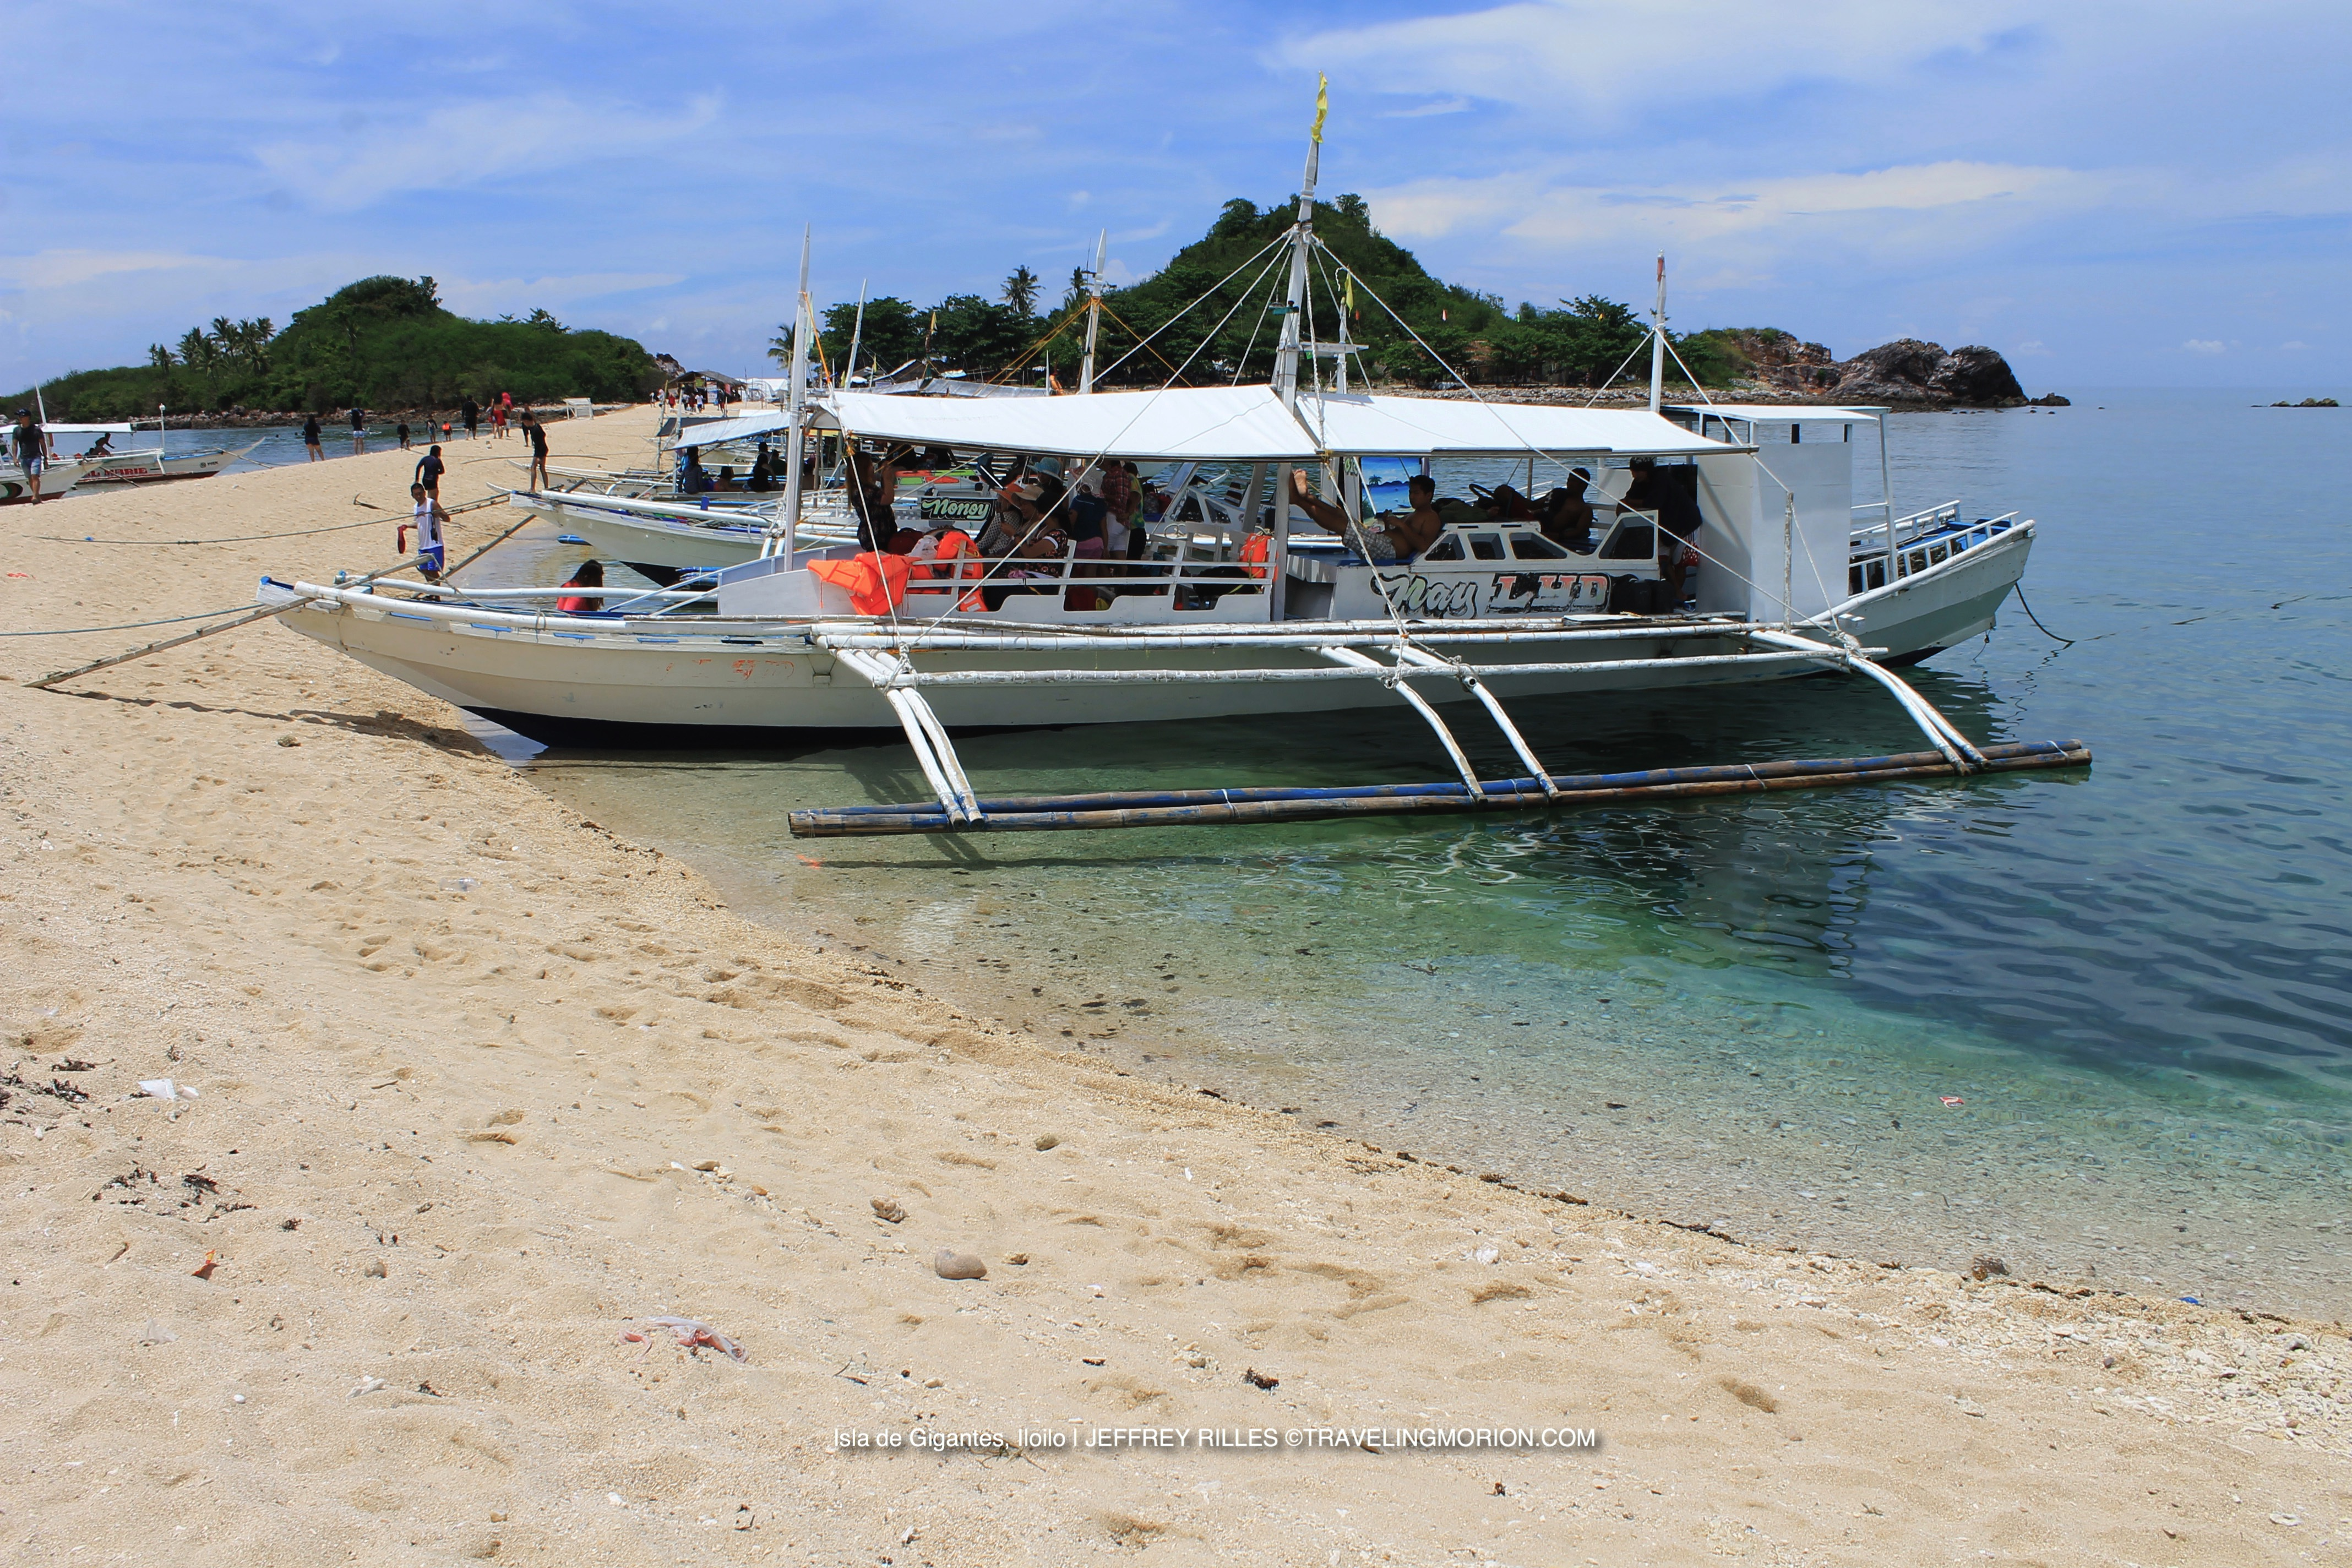 Bantigue Island, Islas de Gigantes